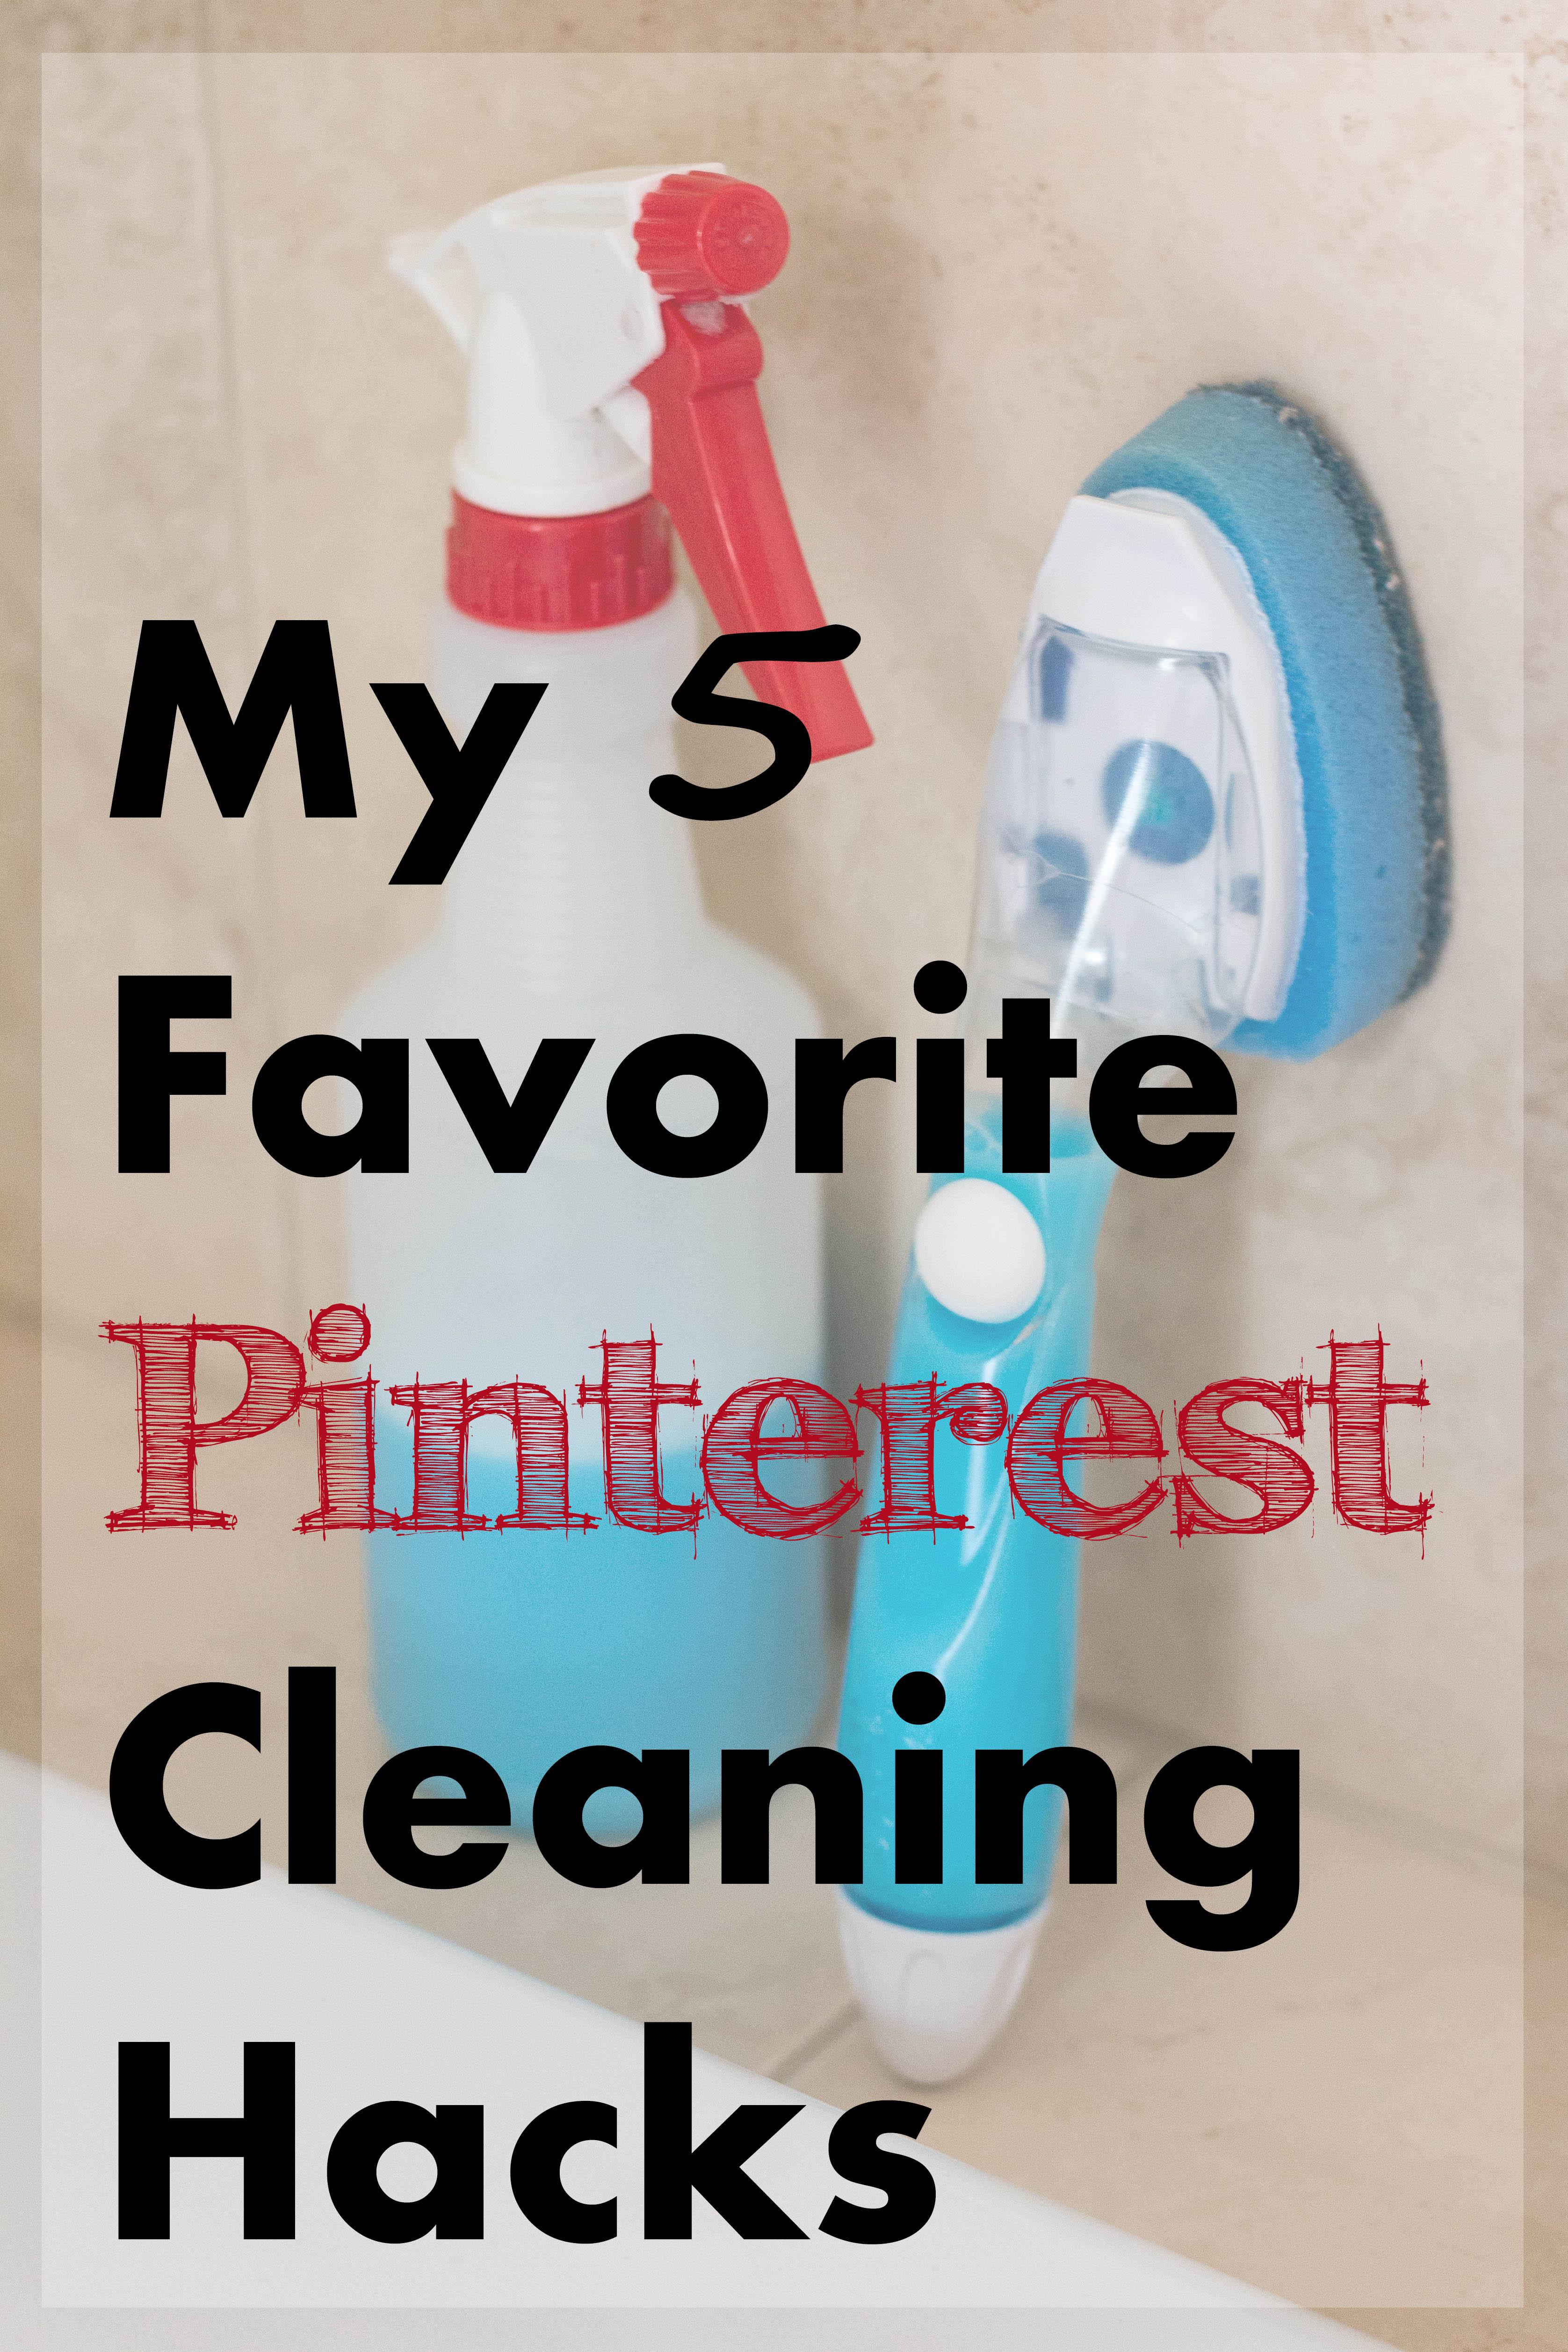 My 5 Favorite Pinterest Cleaning Hacks   https://www.roseclearfield.com